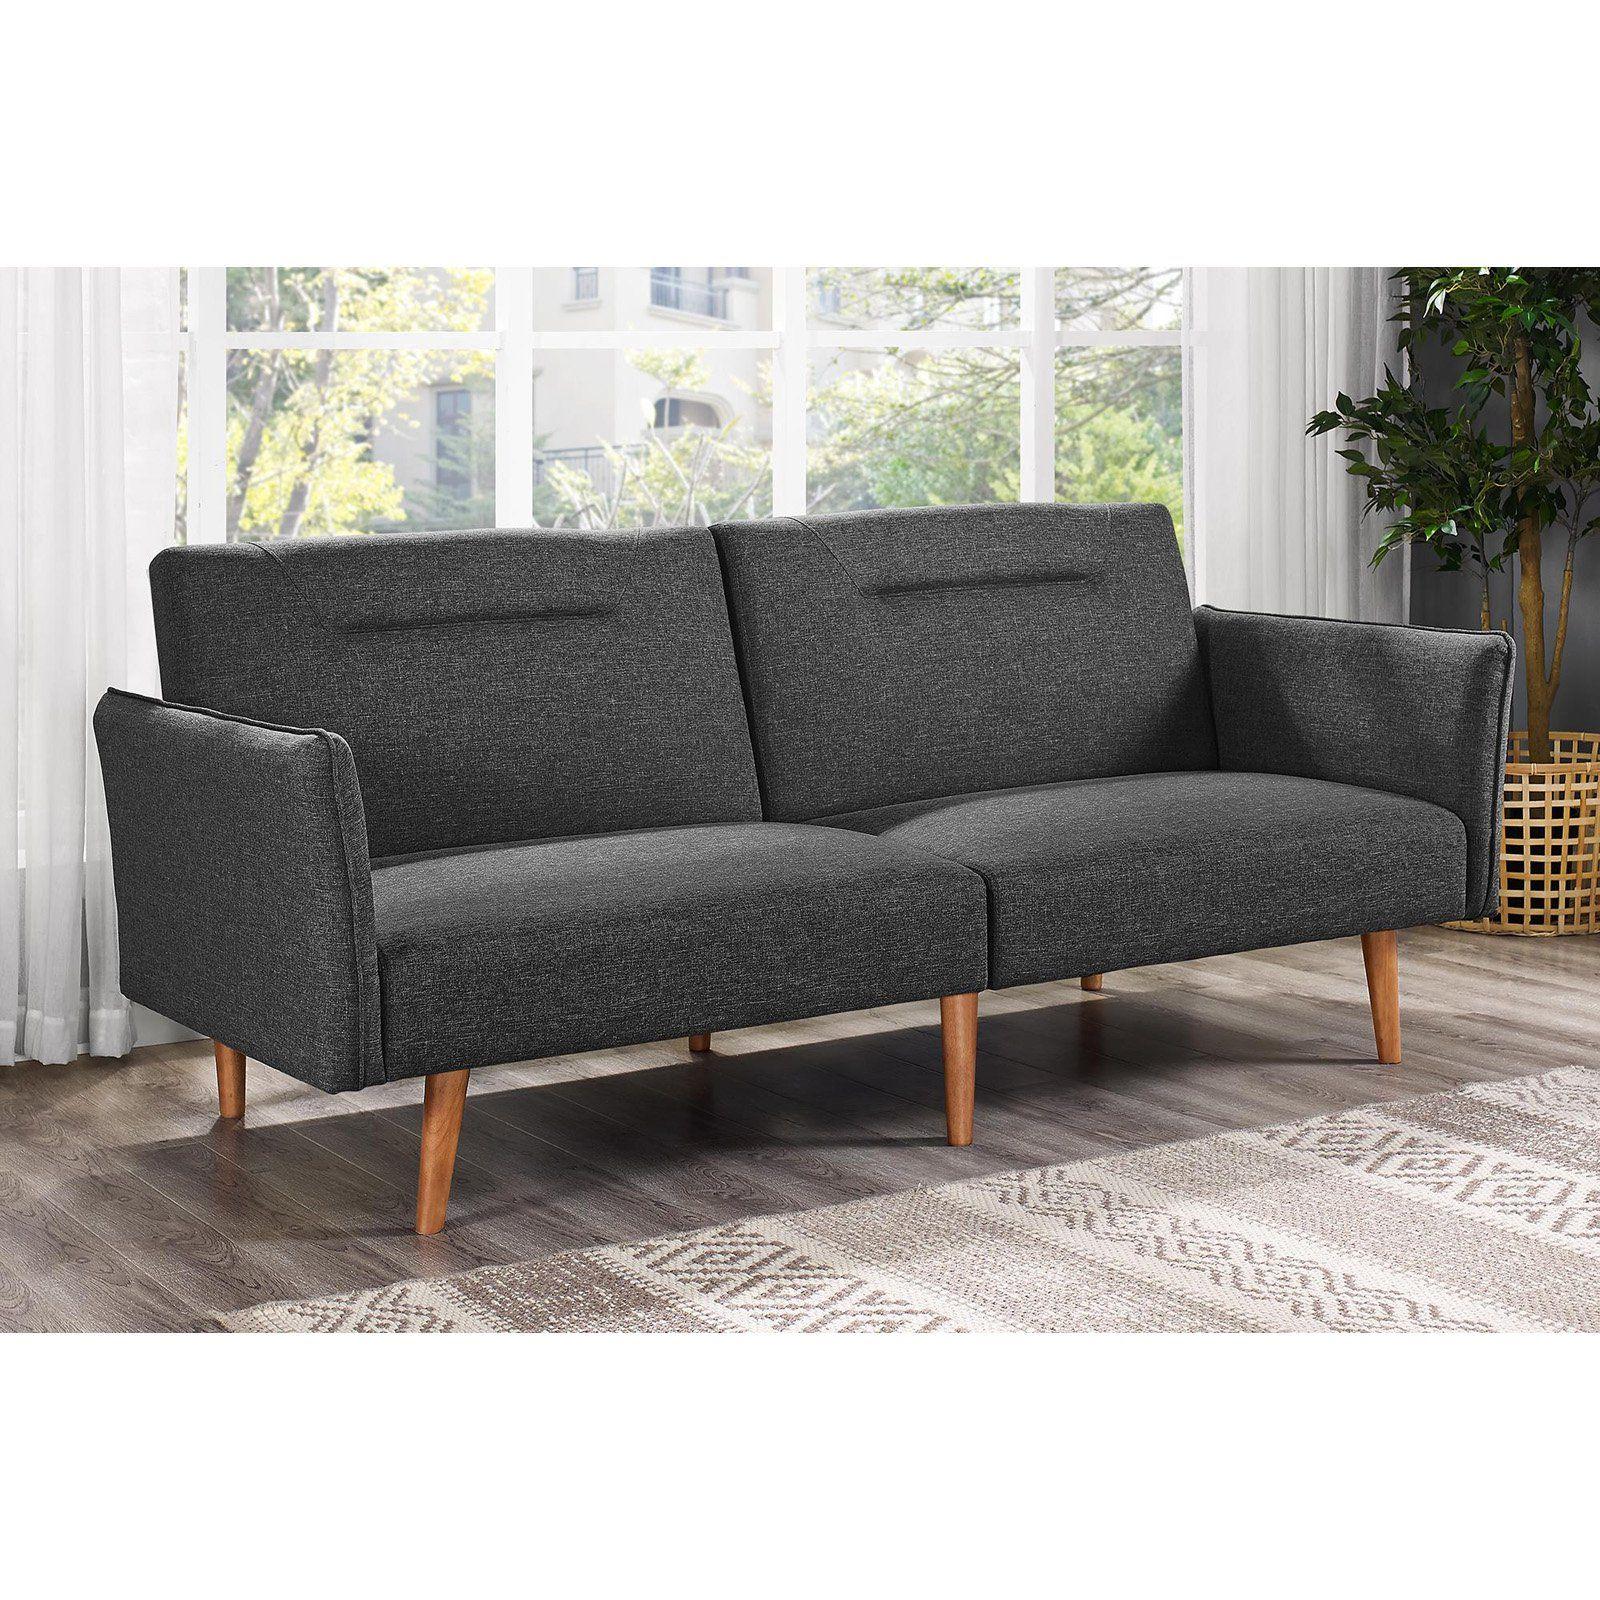 Prime Dhp Brent Futon 2135429 Products Futon Bed Furniture Evergreenethics Interior Chair Design Evergreenethicsorg